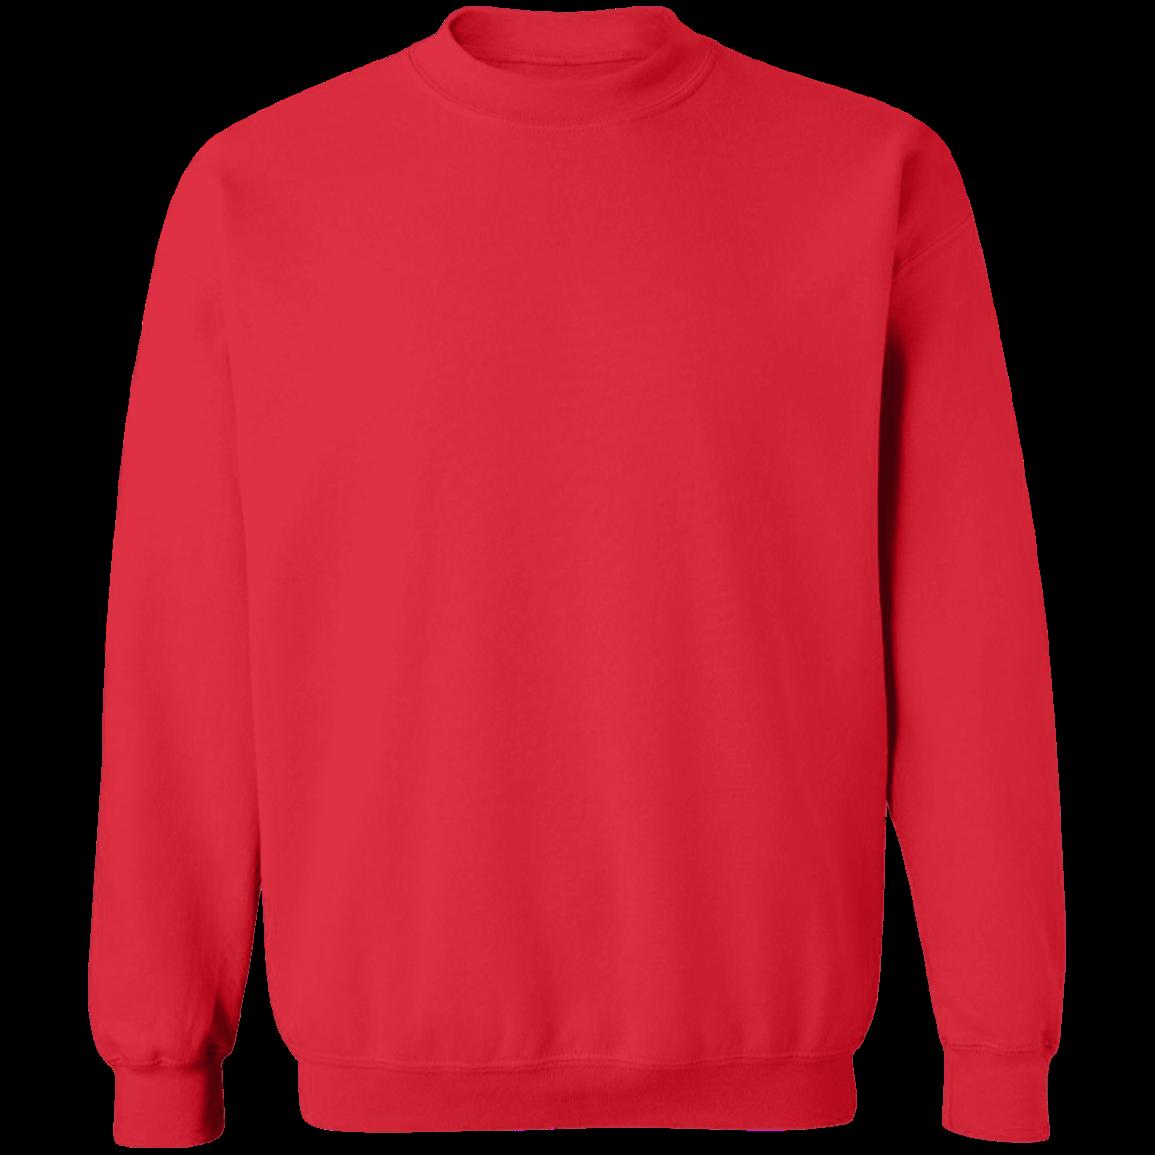 5566f151f4c7 Grassfield High School Adult Crewneck Pullover Sweatshirt 8 oz -  SpiritShop.com